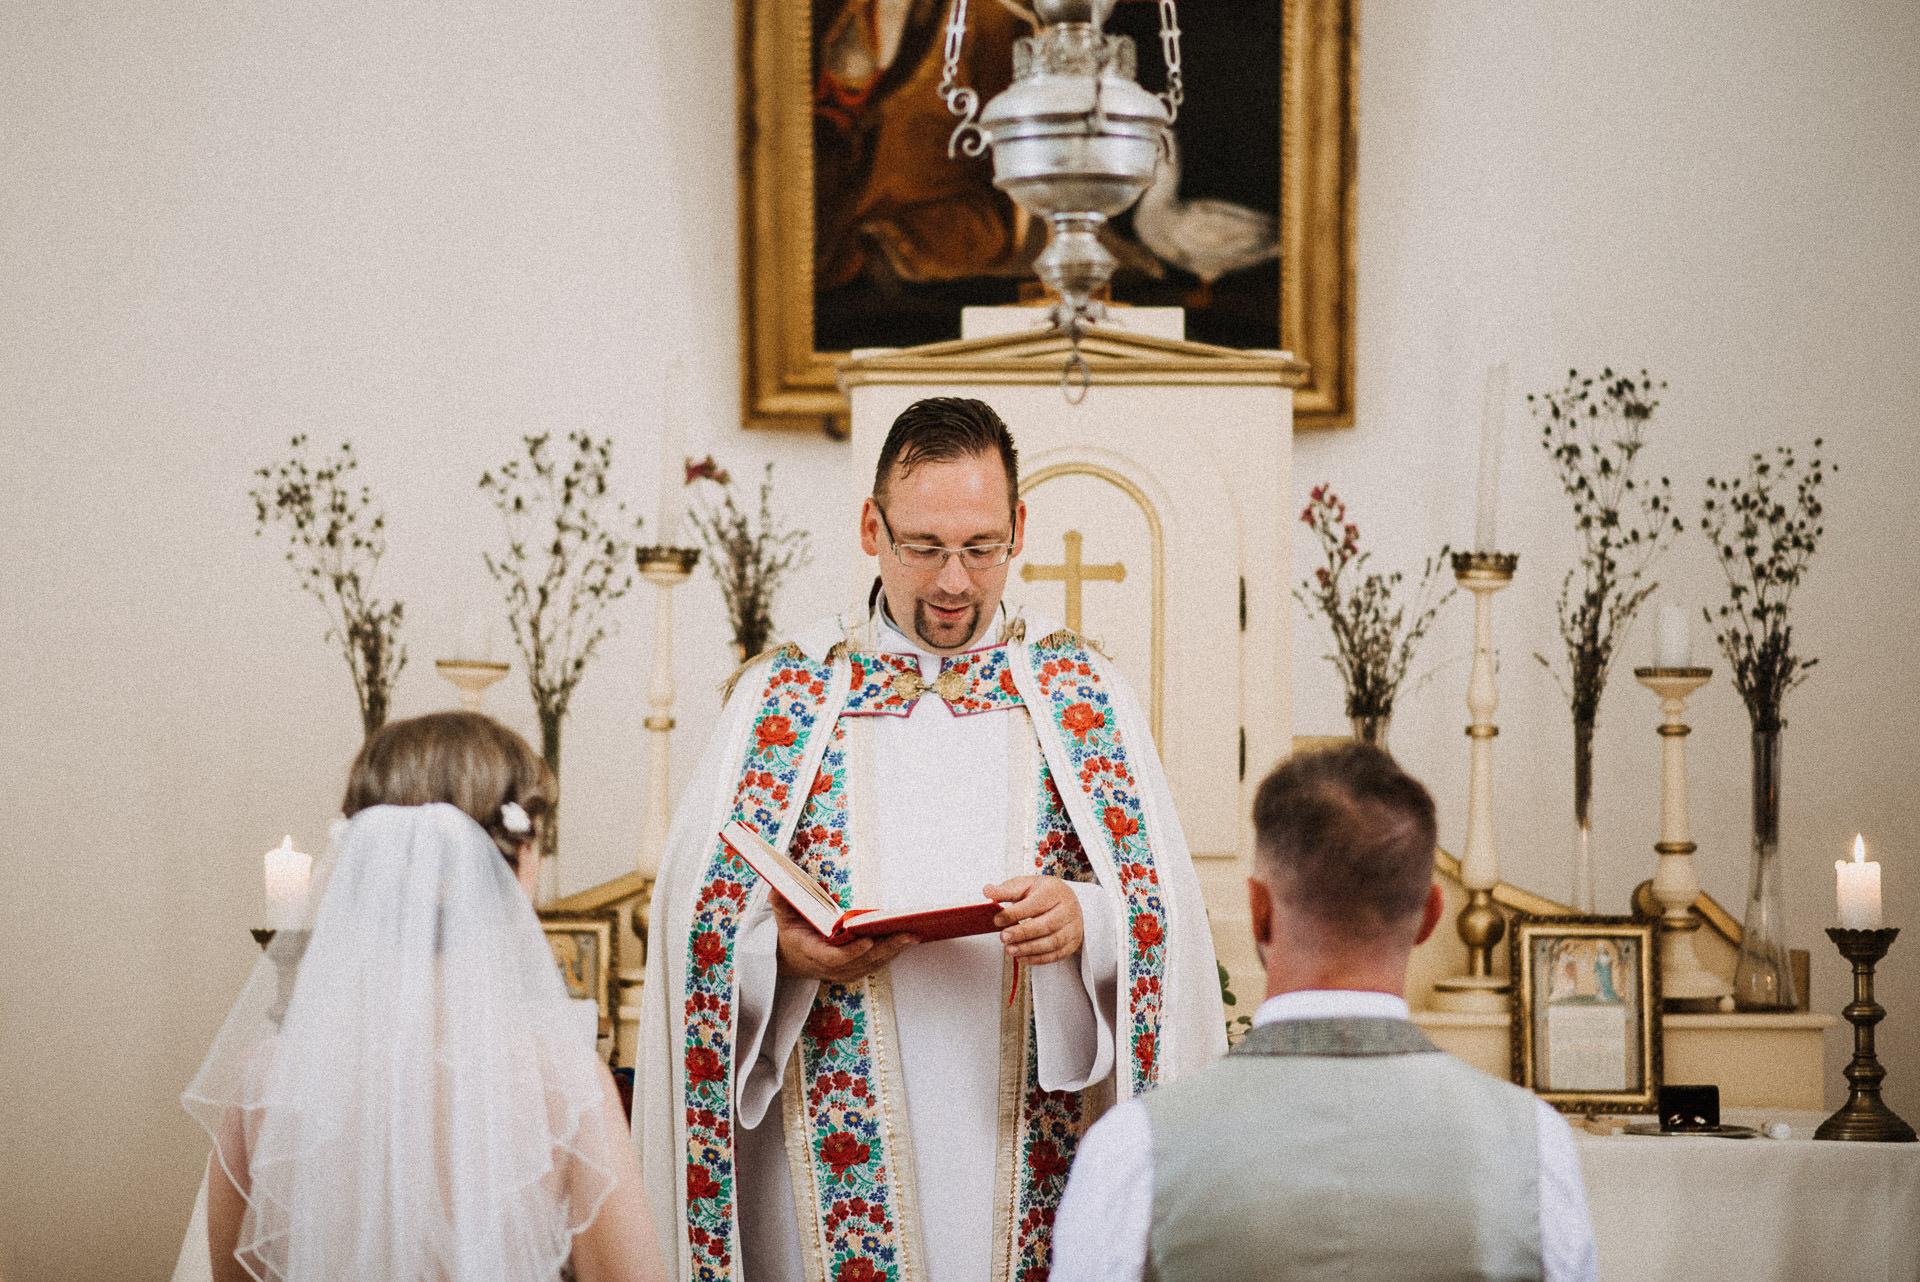 pap priest bride groom volegeny menyasszony szertartas ceremony